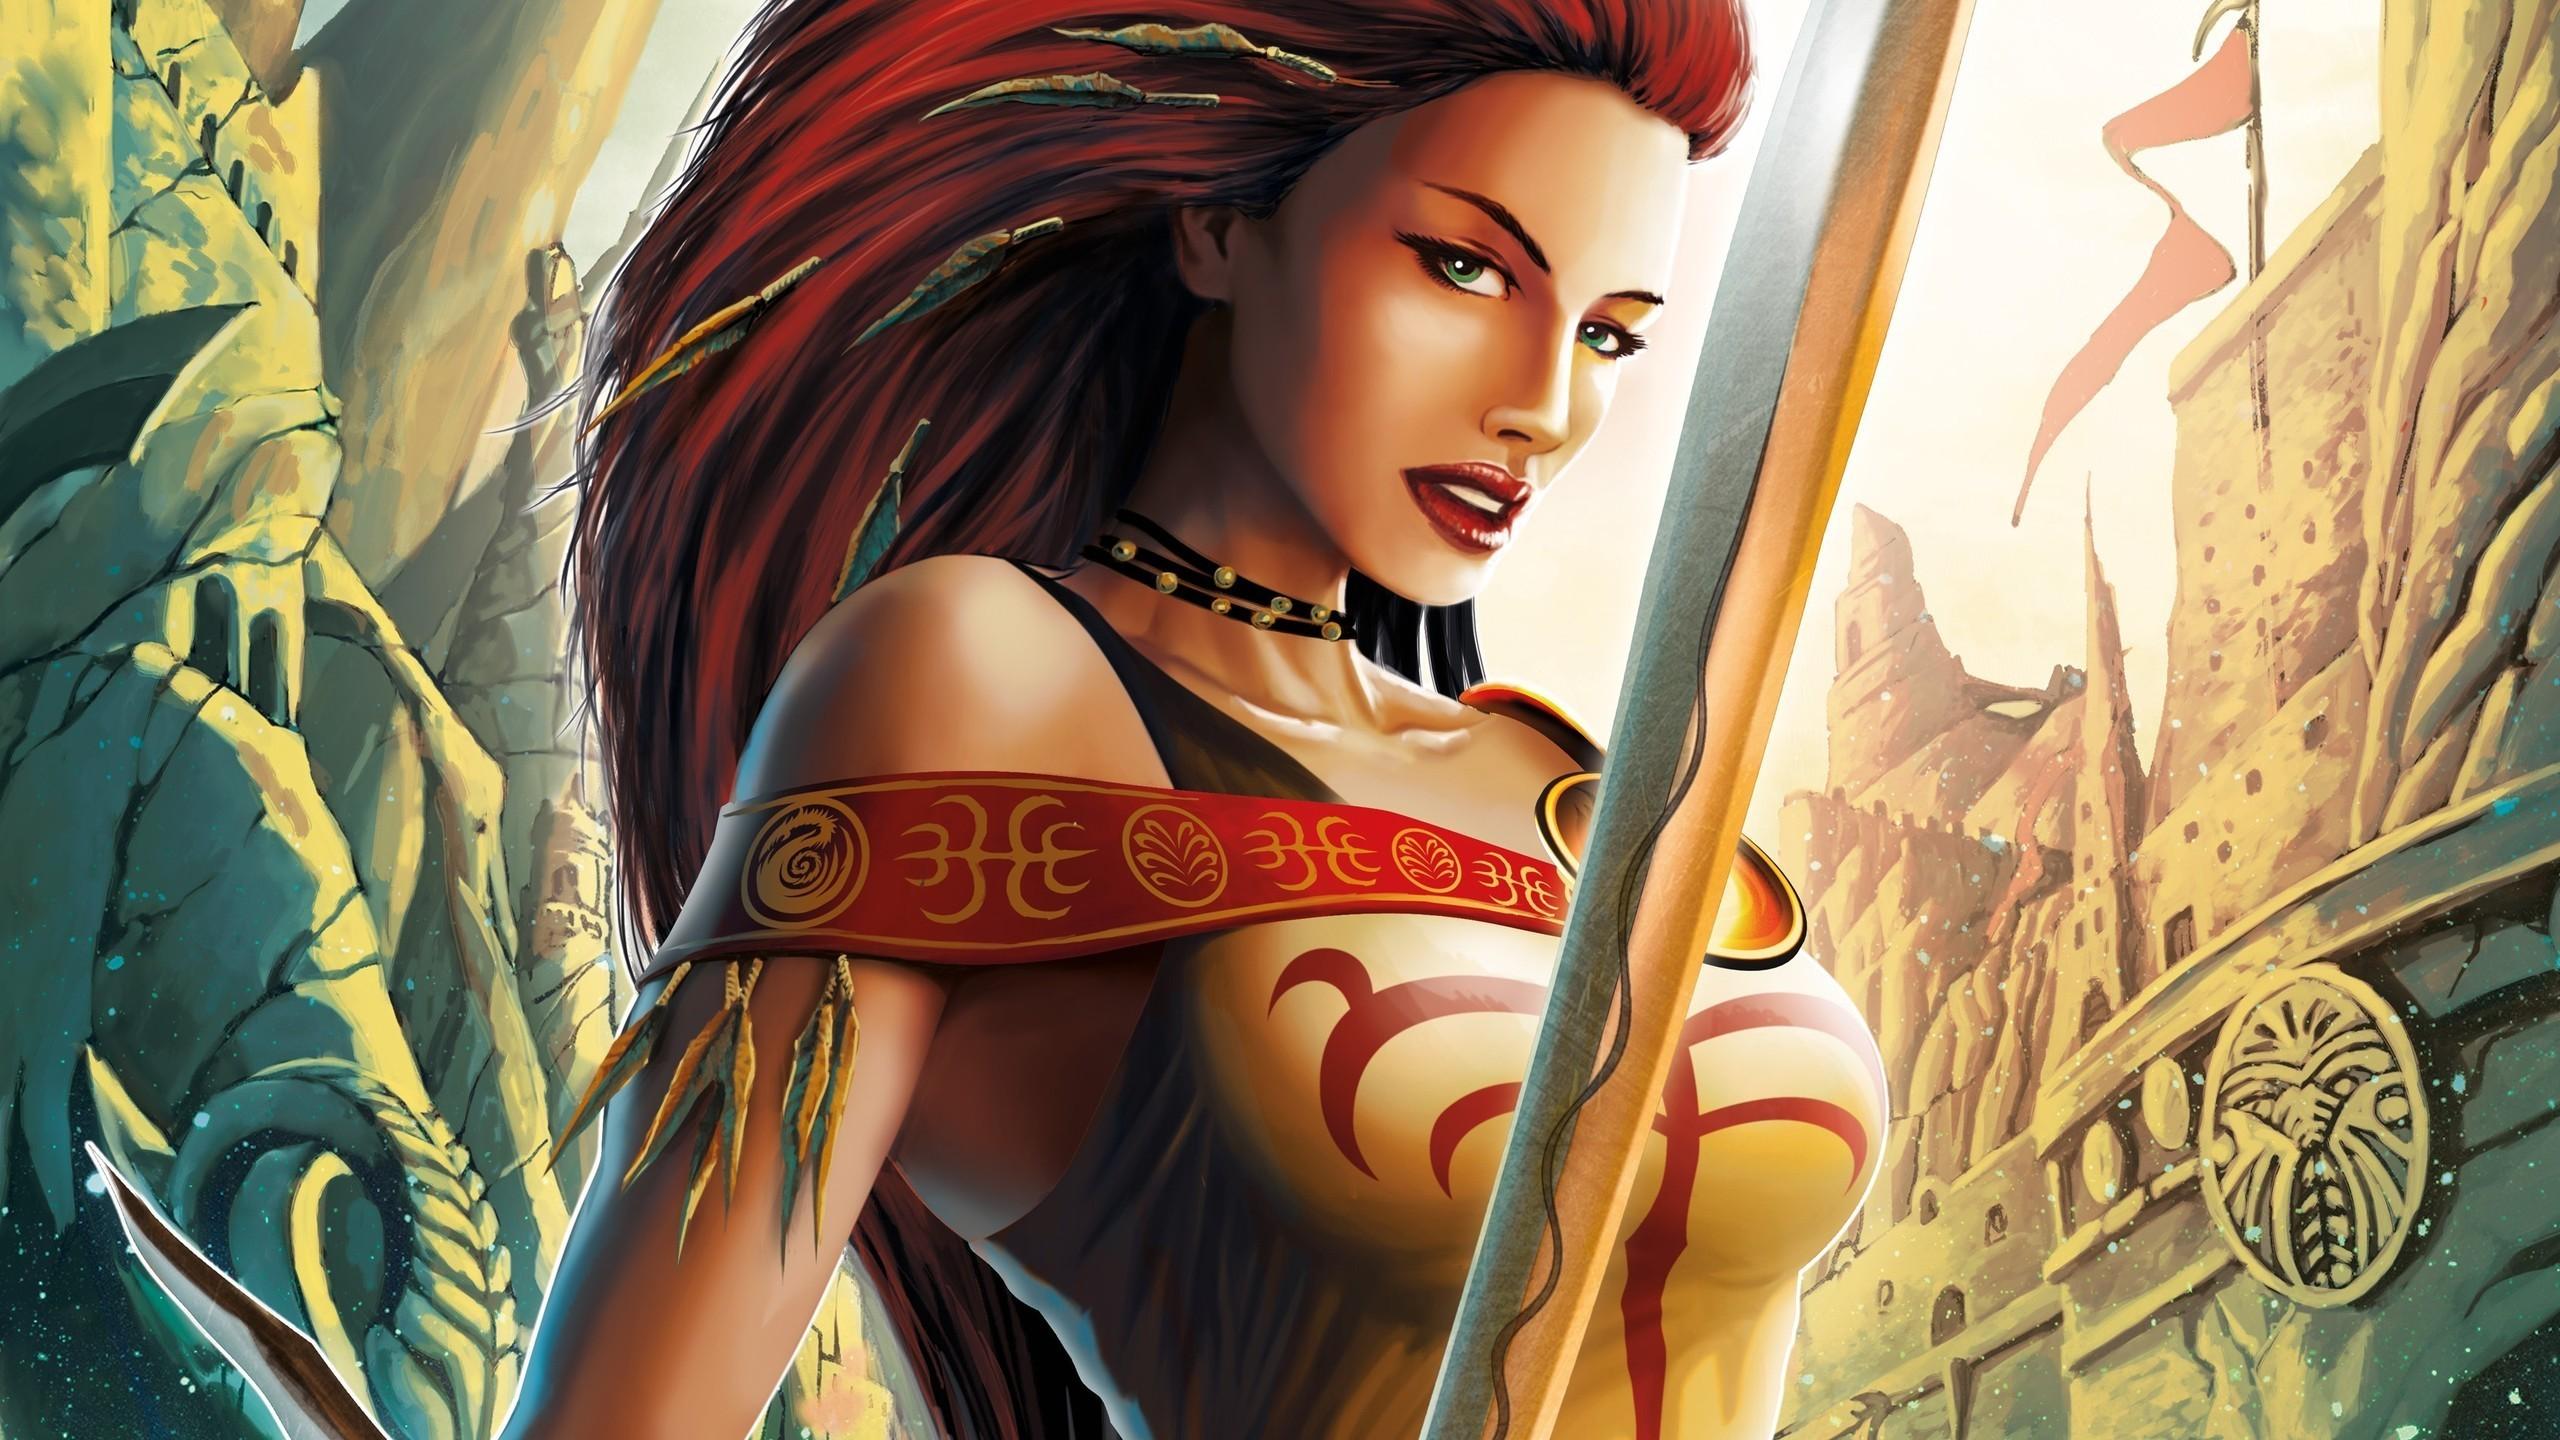 Fantasy women warriors wallpaper 84 images - Fantasy female warrior artwork ...